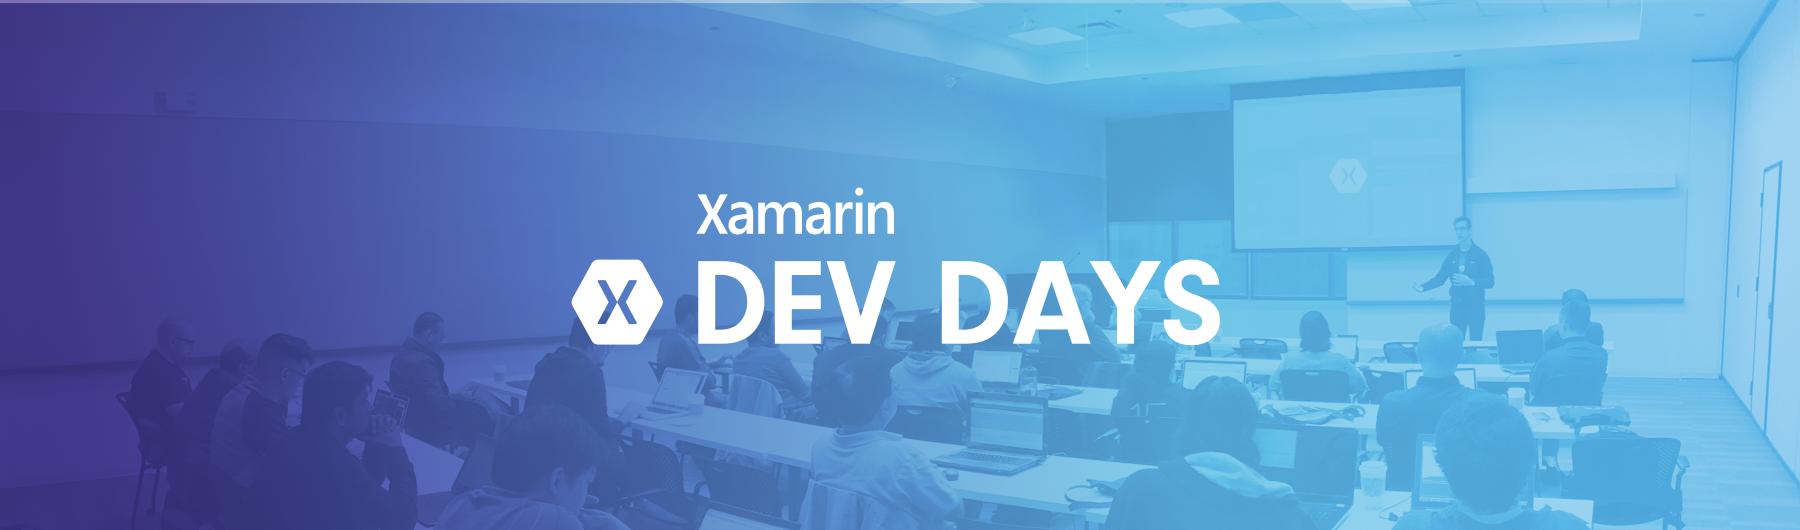 Xamarin Dev Days - Warsaw